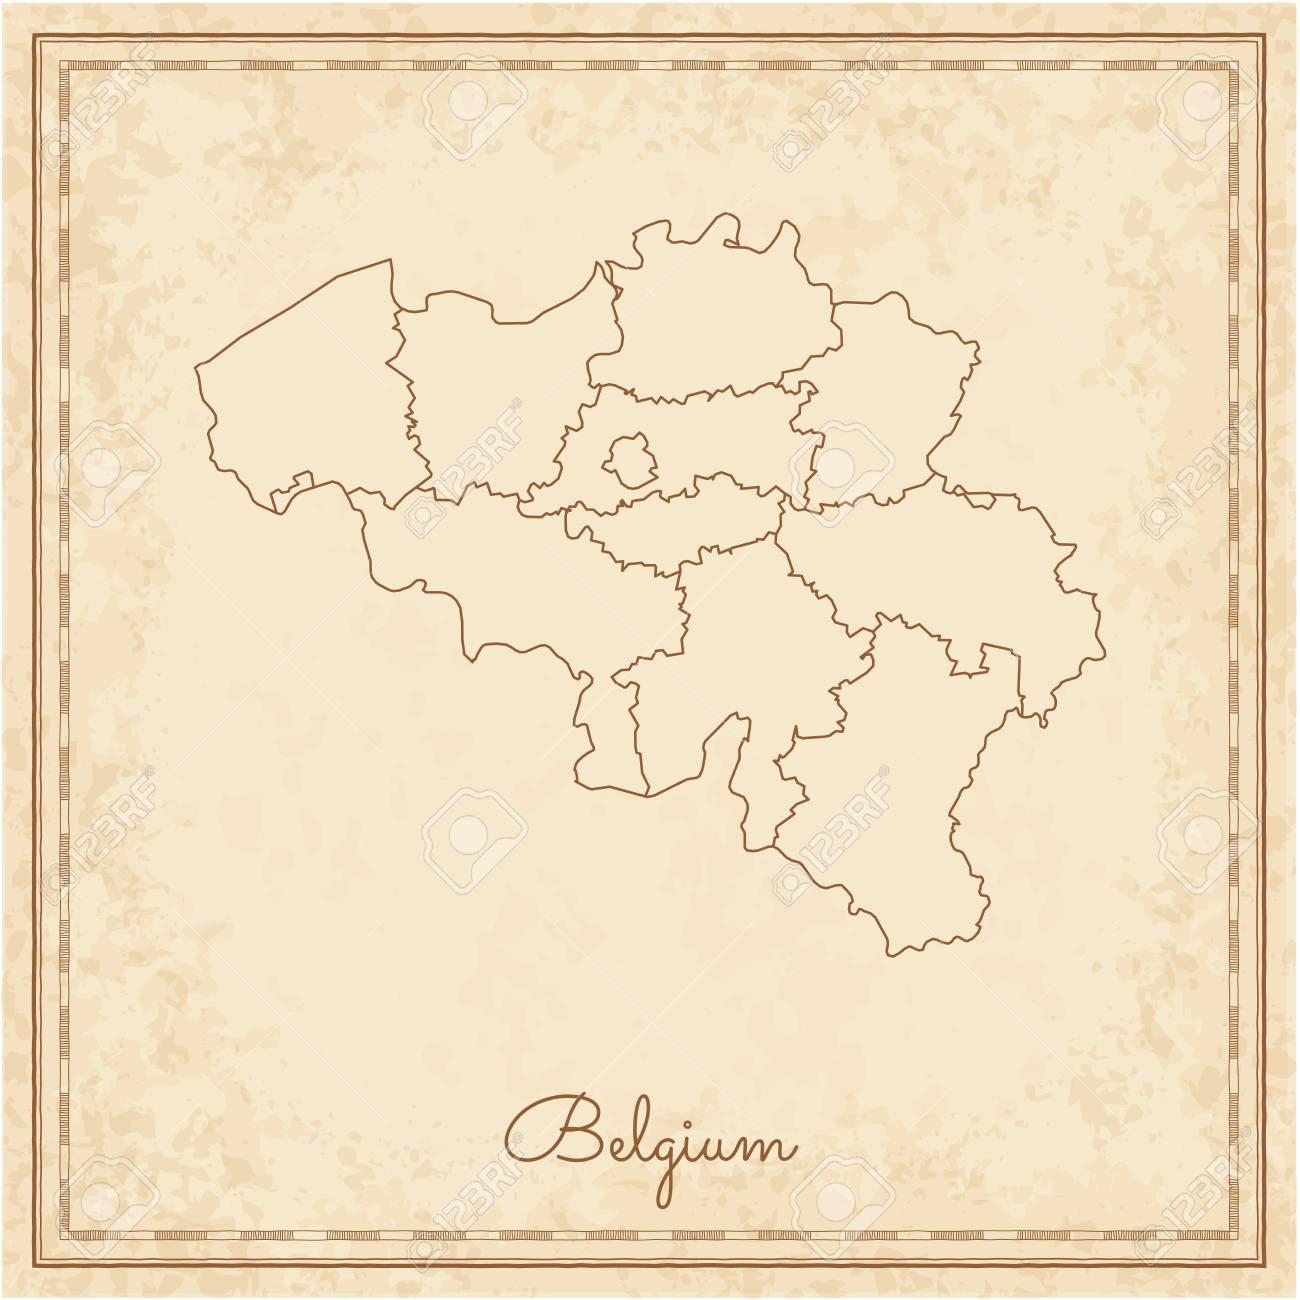 belgium region map stilyzed old pirate parchment imitation detailed map of belgium regions